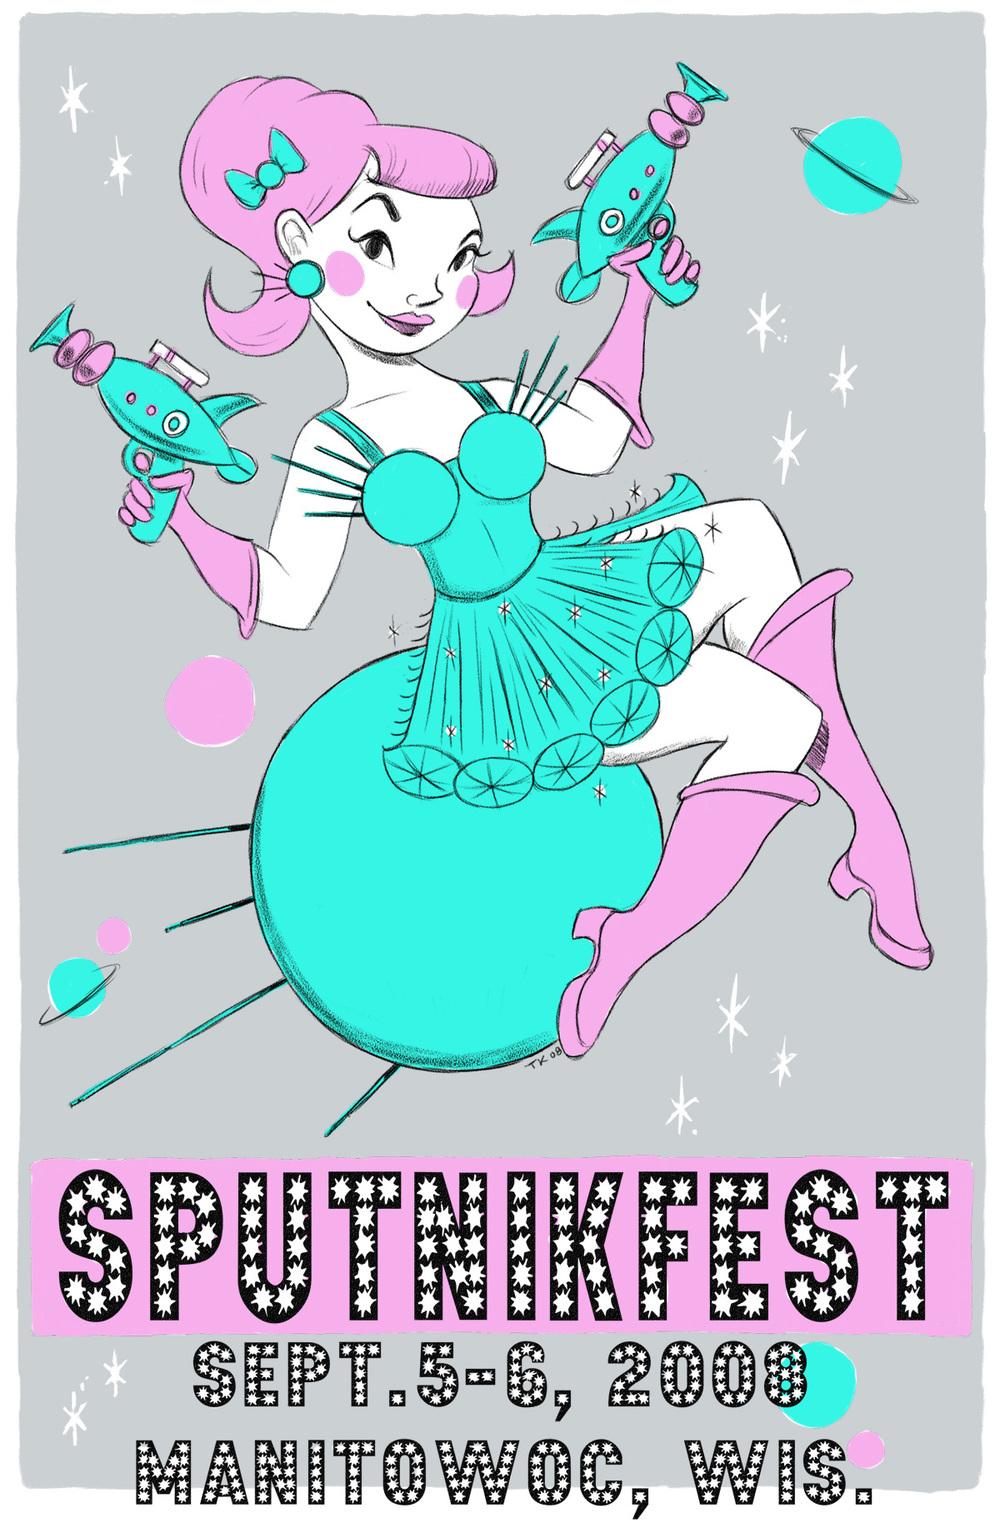 First Sputnikfest Teaser Poster 2008